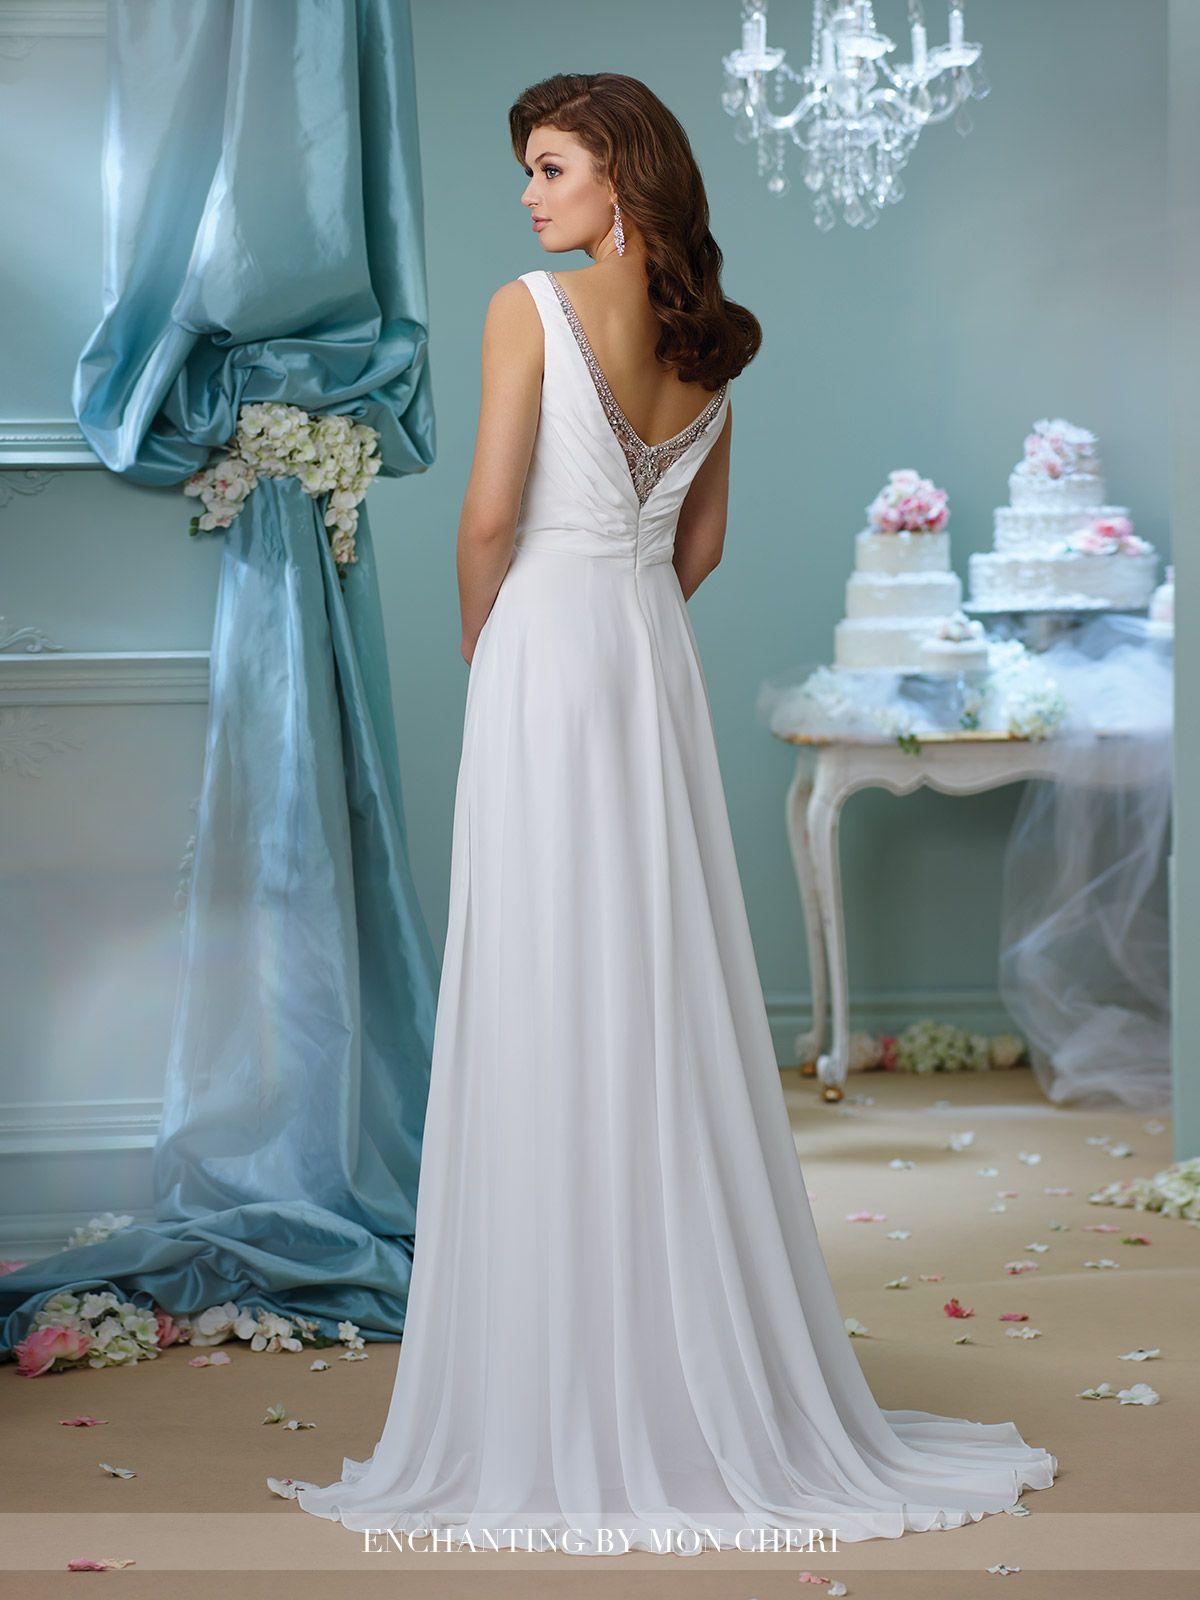 Illusion V-Neckline Wedding Dress- 216166- Enchanting by Mon Cheri ...